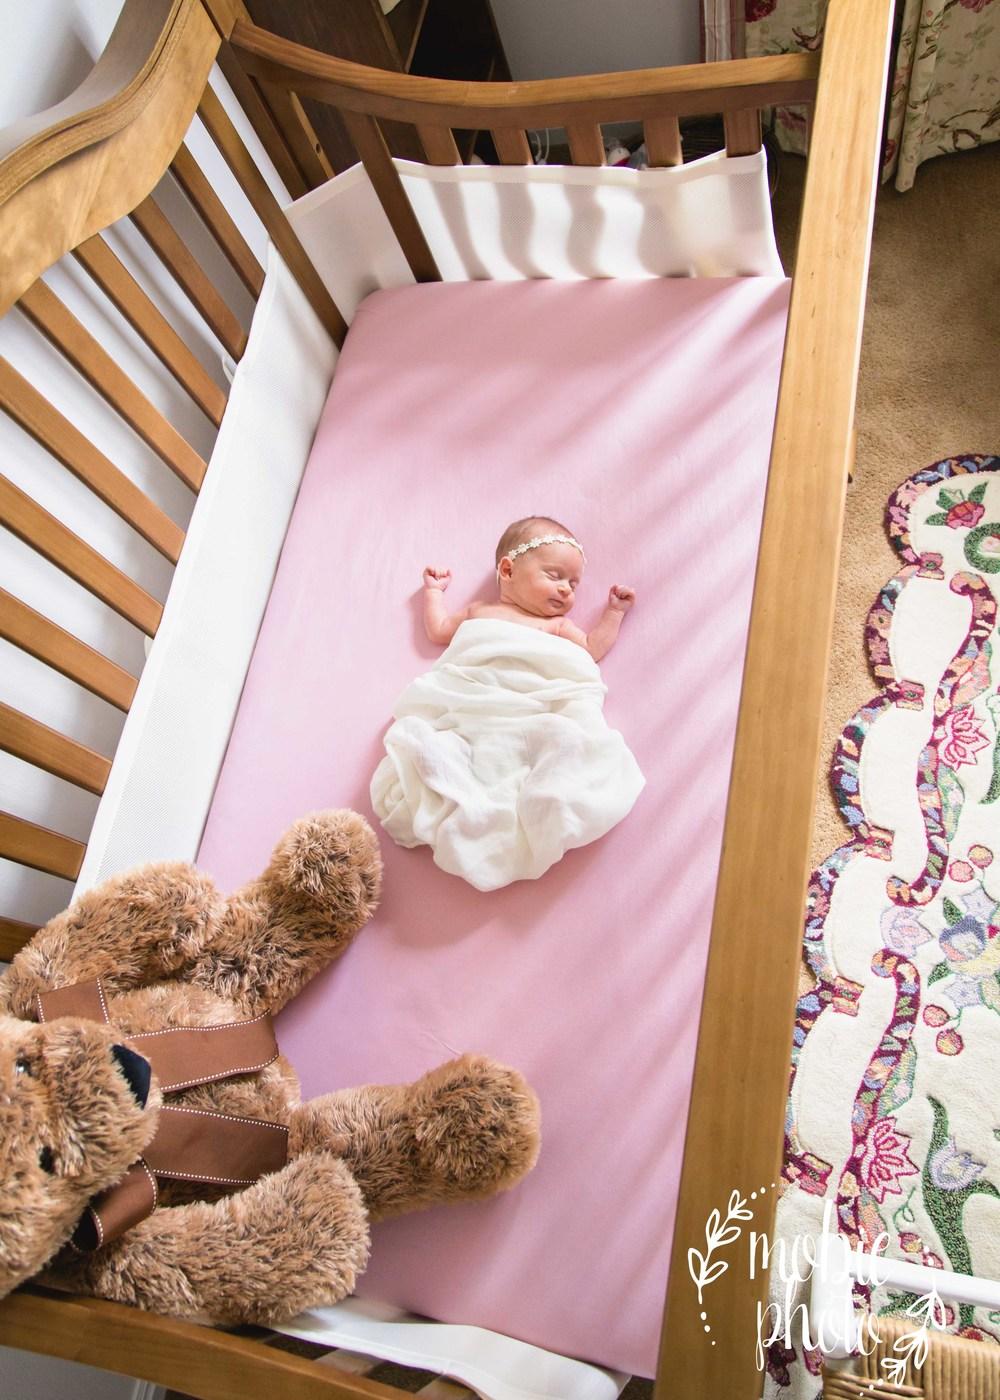 Mobie Photo - In-home newborn photography - Springville, Utah